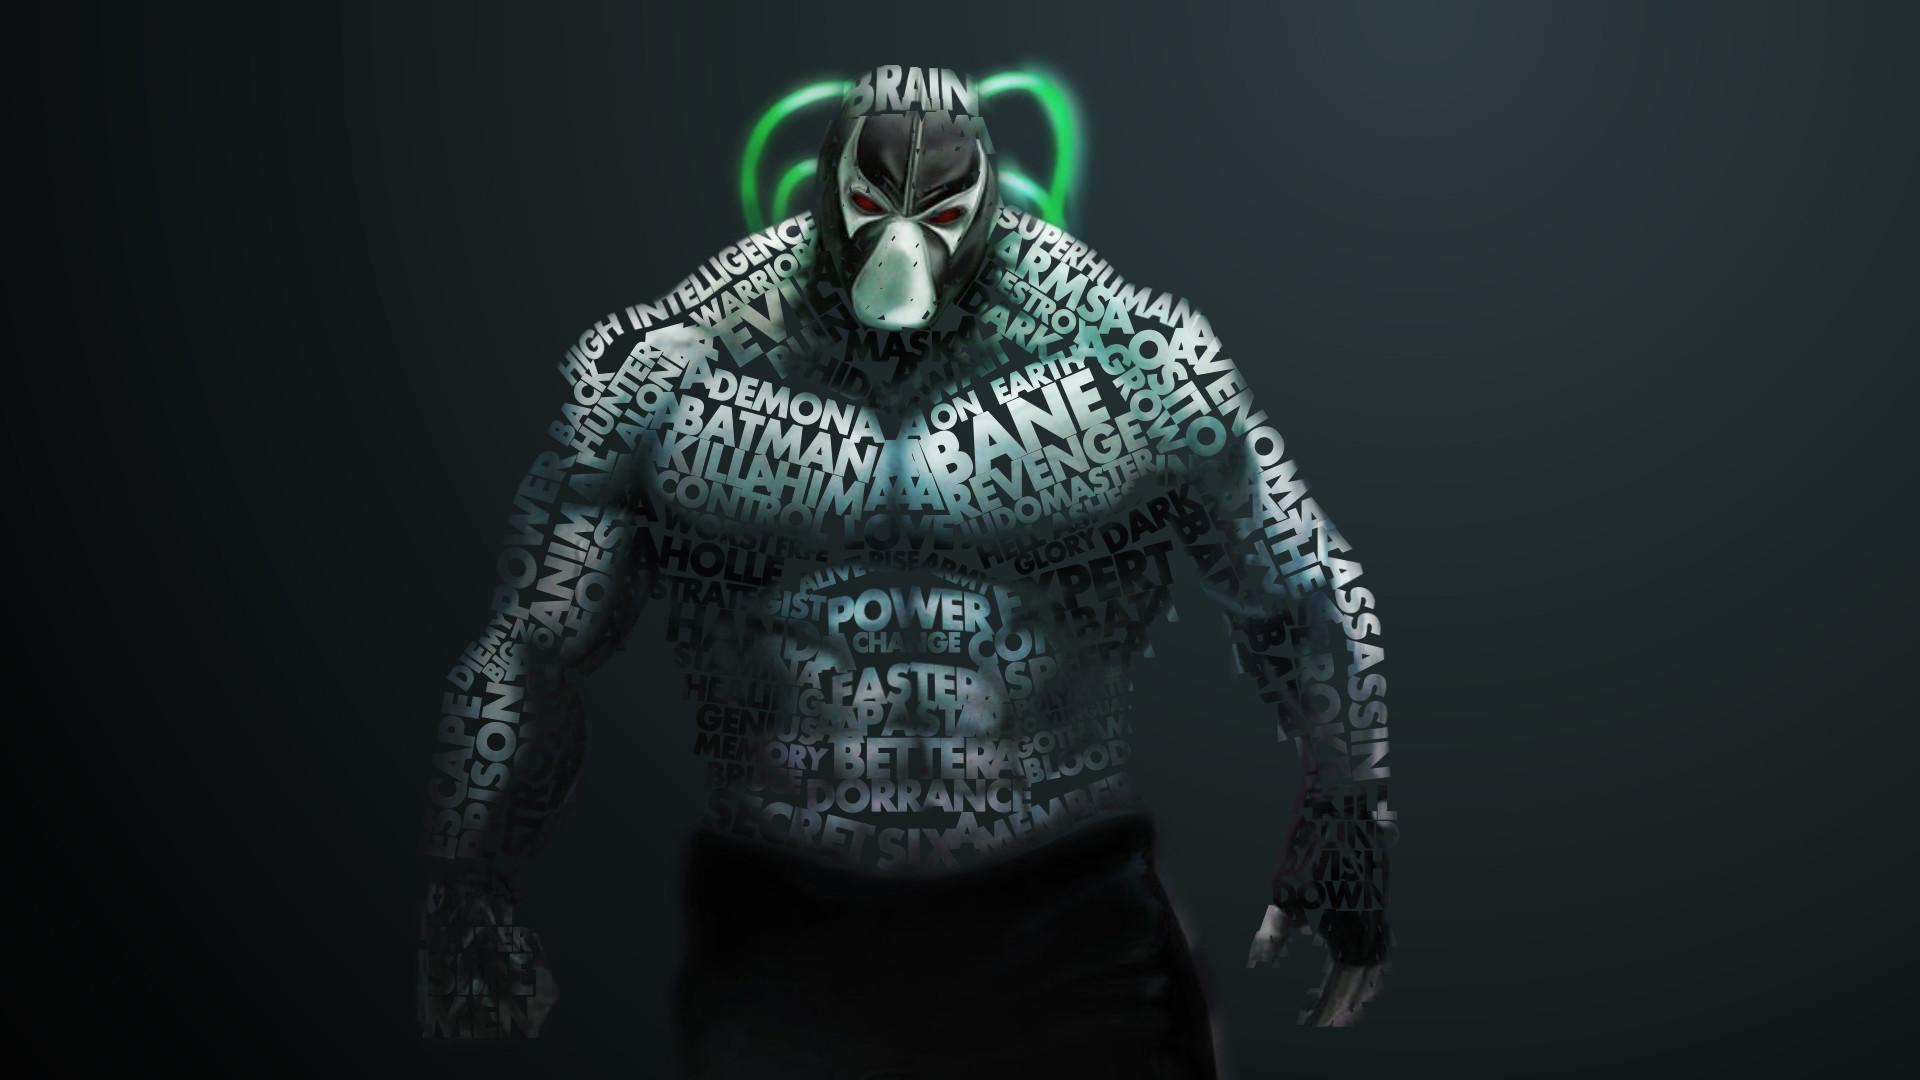 Superheroes and villains Digital Art HD wallpaper